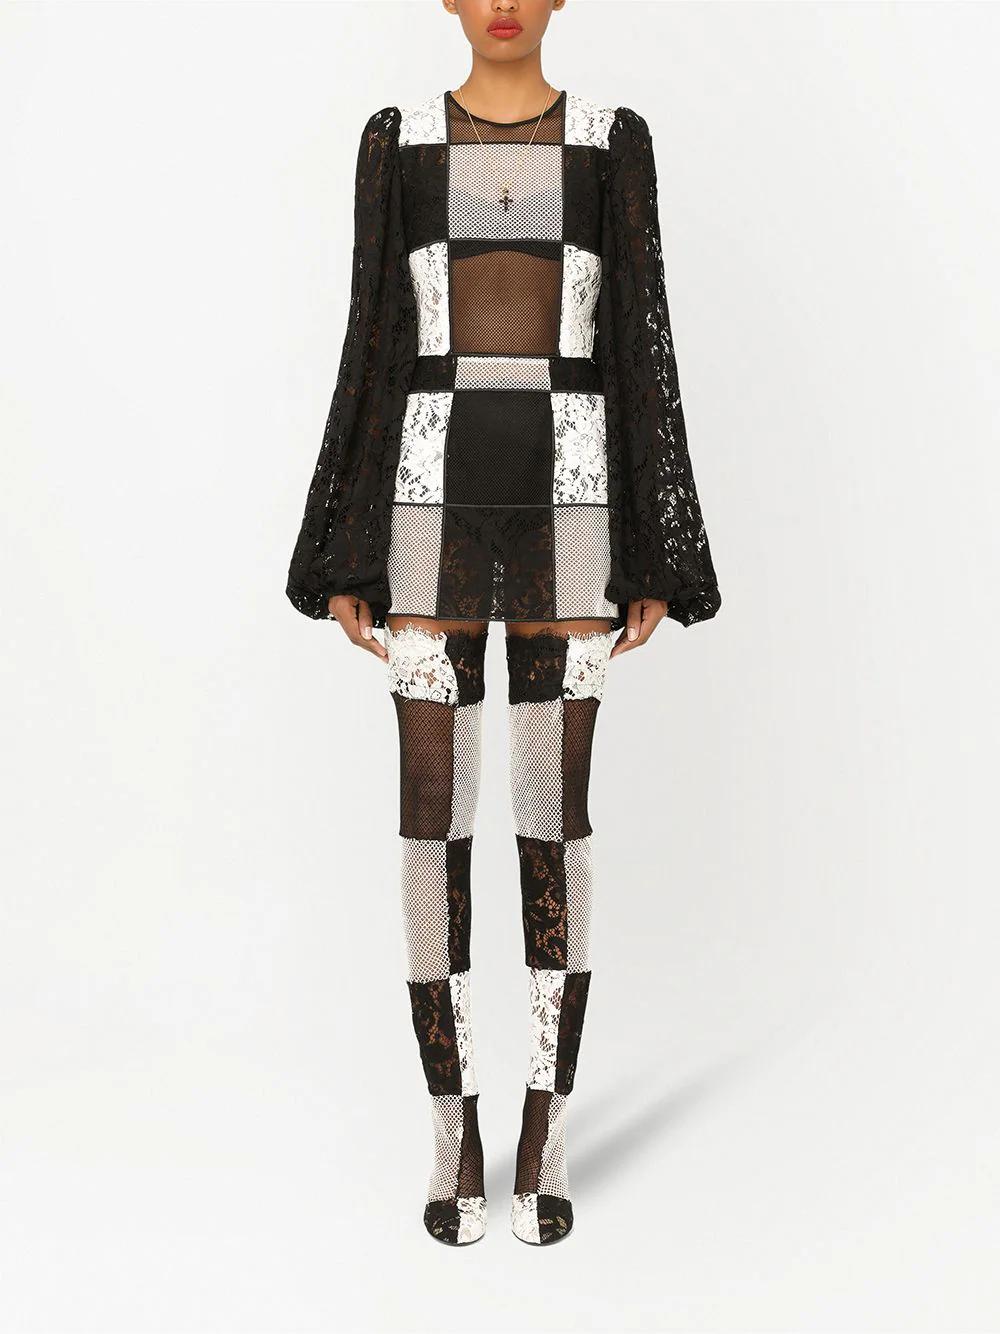 Dolce & Gabbana Checkerboard Lace Dress 7720лв